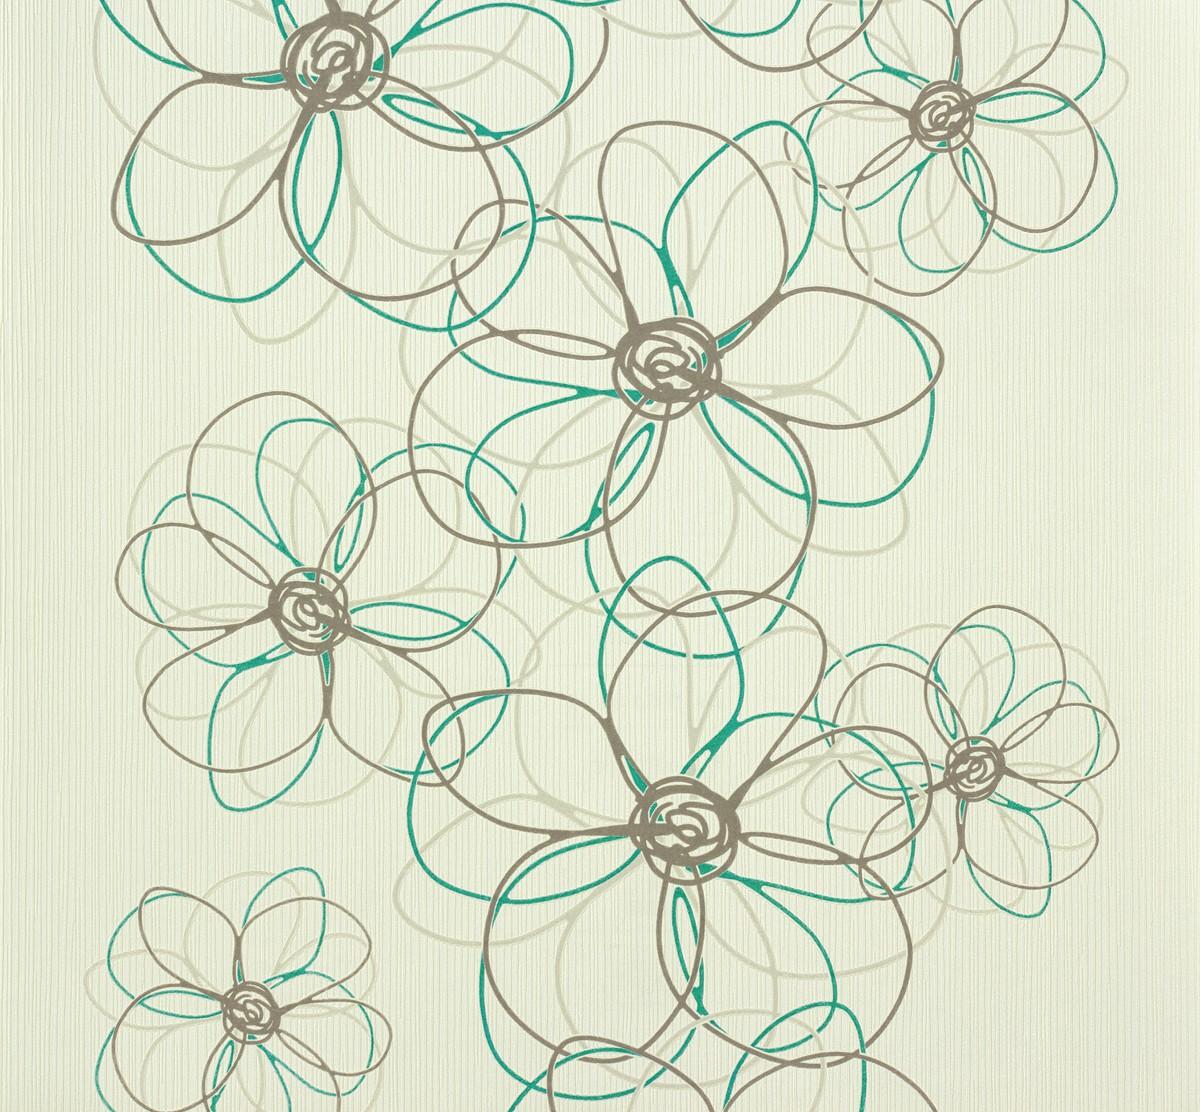 Non woven wallpaper ok 6 as creation 94443 2 944432 flower white non woven wallpaper ok 6 as creation 94443 2 944432 flower white grey turquoise mightylinksfo